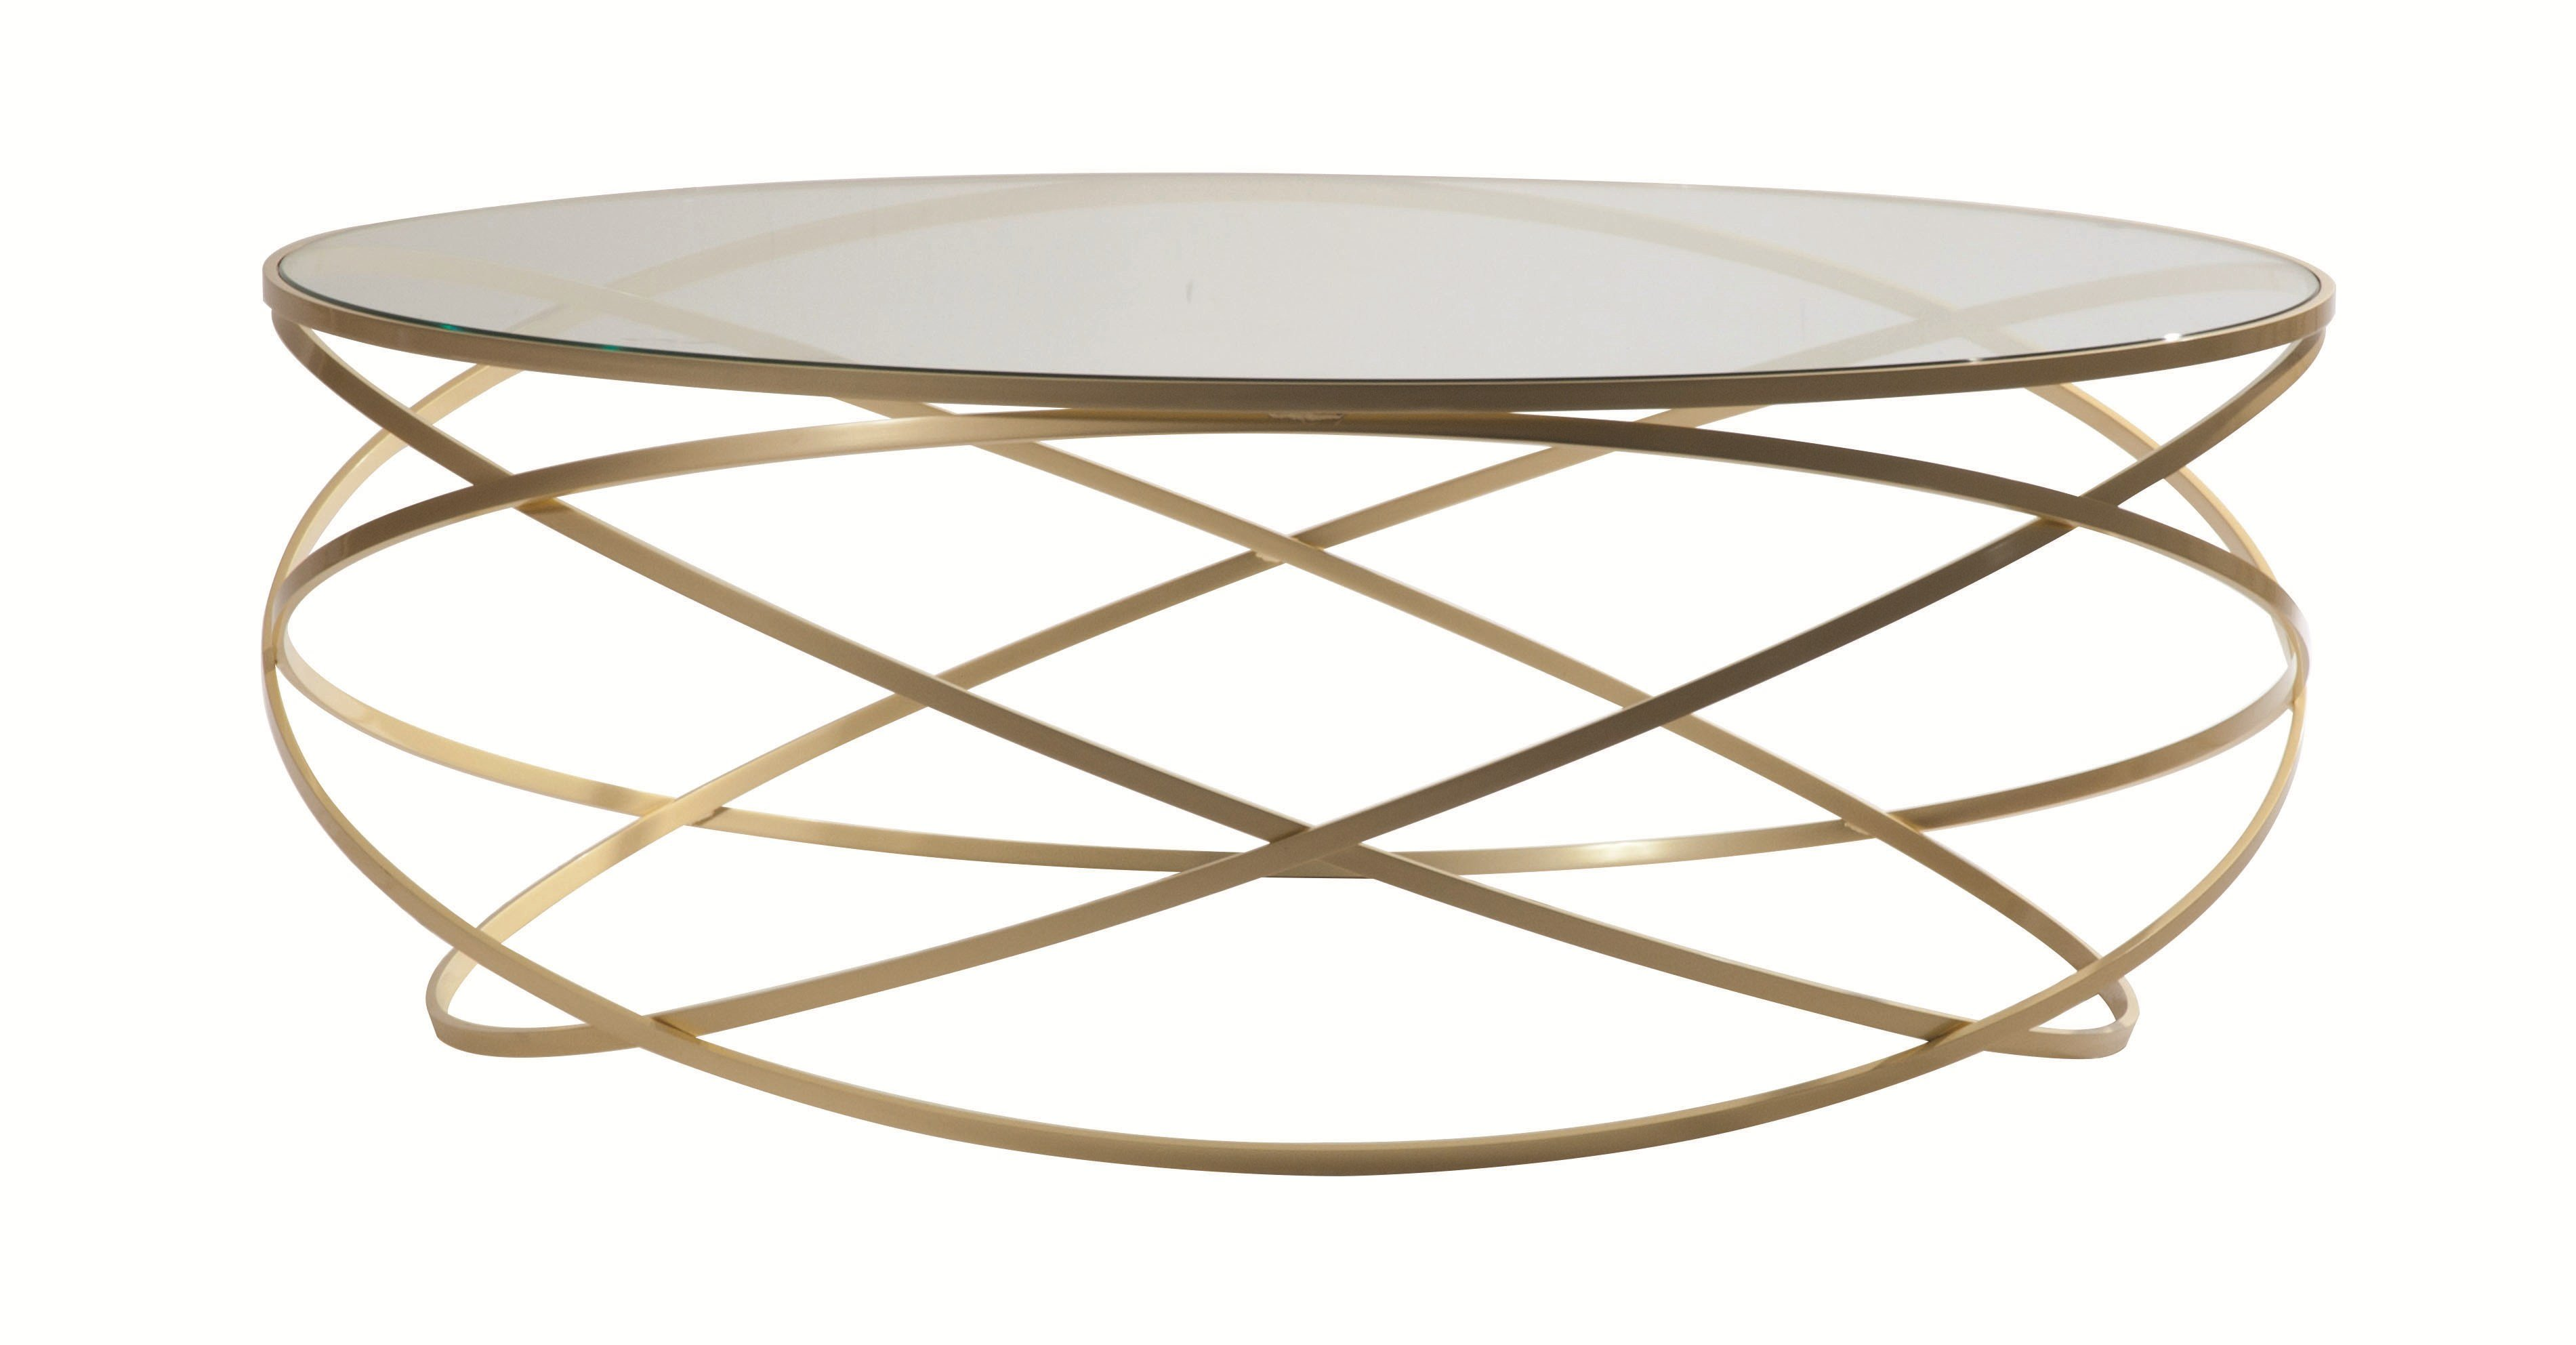 table basse ronde en acier et verre evol by roche bobois design c dric ragot. Black Bedroom Furniture Sets. Home Design Ideas